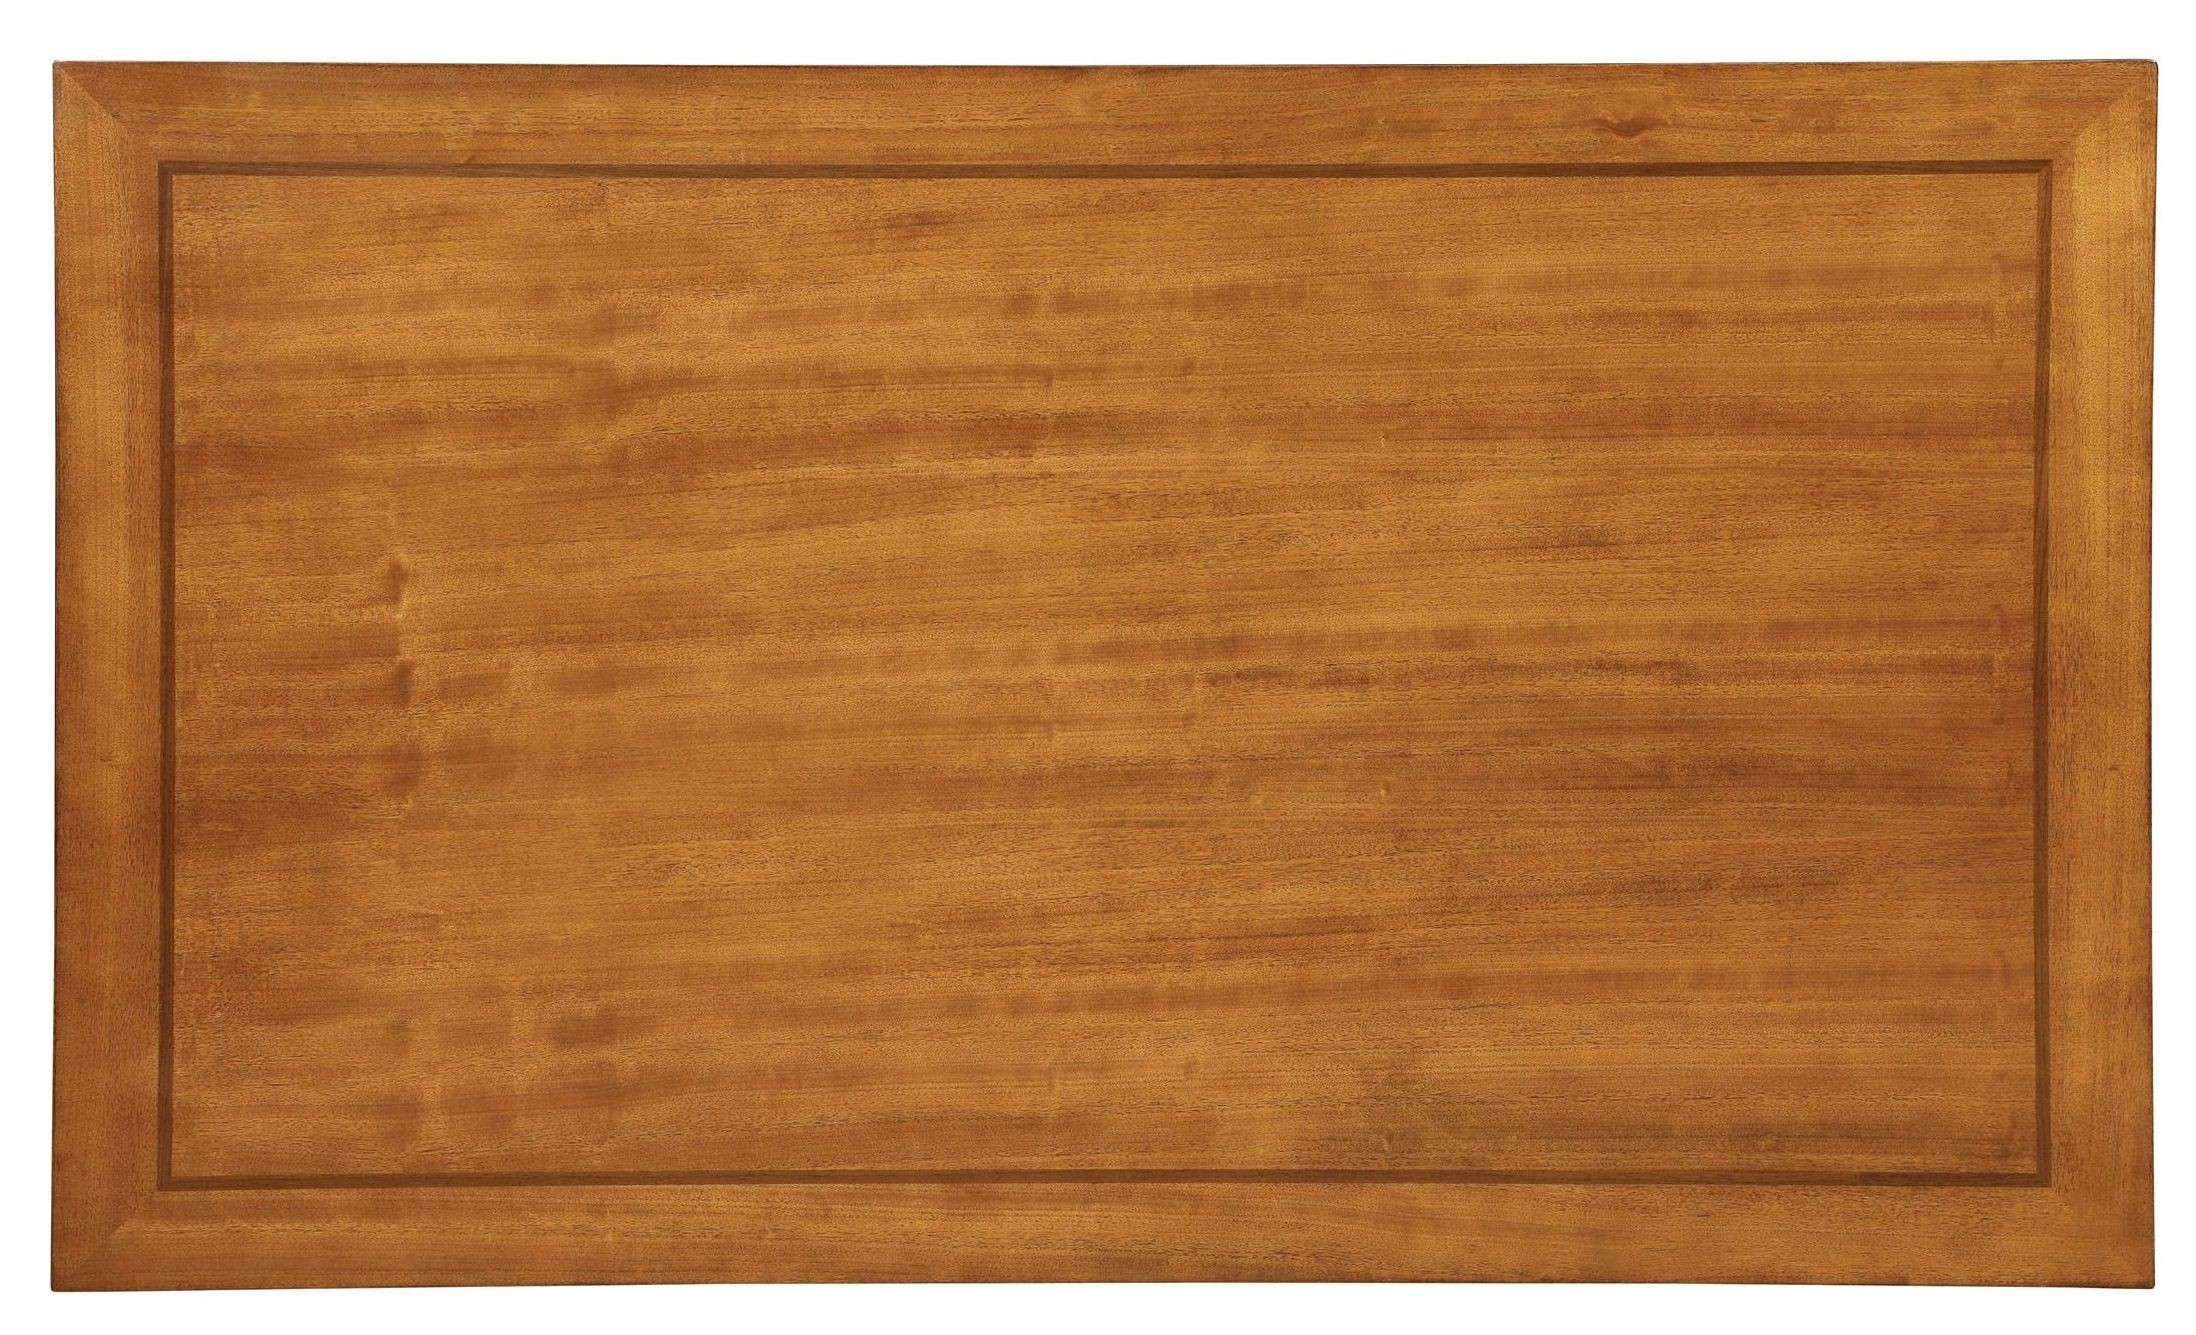 Netlight Oak Dining Room Sets : Freeman I Light Oak 7 Piece Dining Room Set from Furniture of America ...